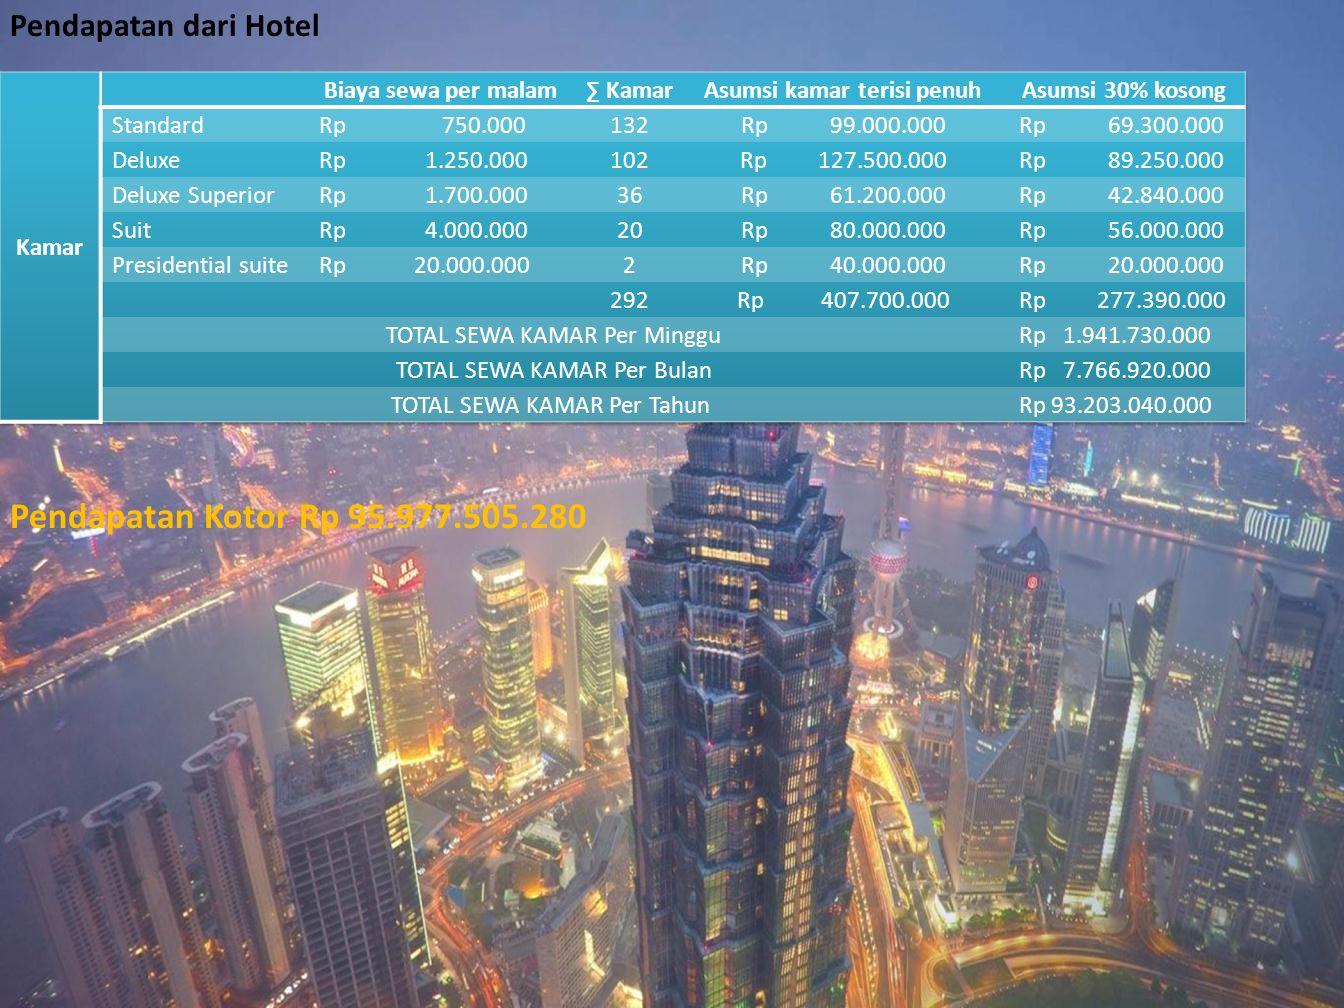 Pendapatan dari Hotel Pendapatan Kotor Rp 95.977.505.280